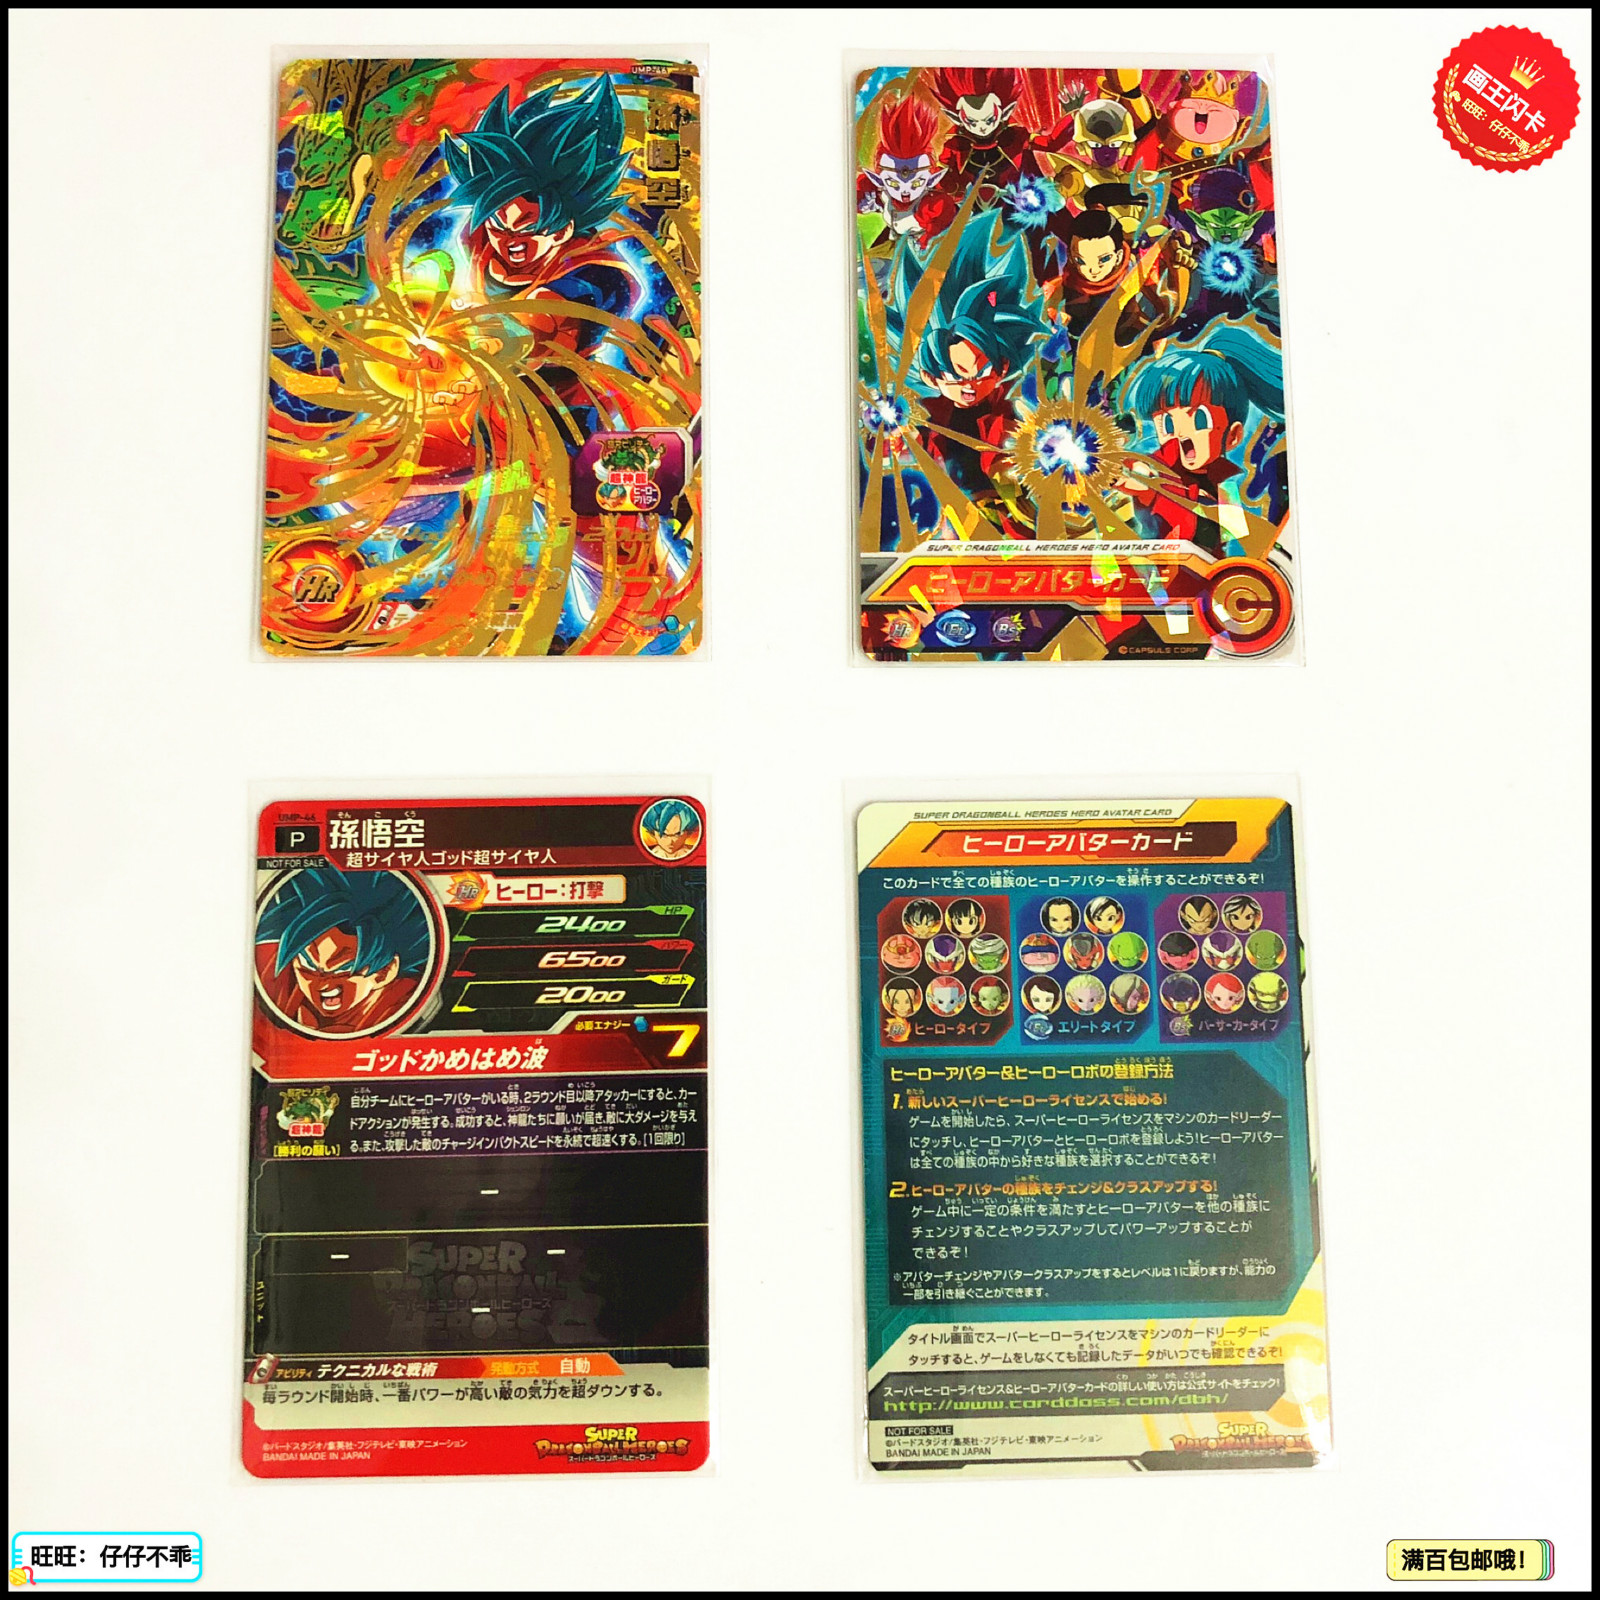 Japan Original Dragon Ball Hero Card UMP 46Goku Toys Hobbies Collectibles Game Collection Anime Cards